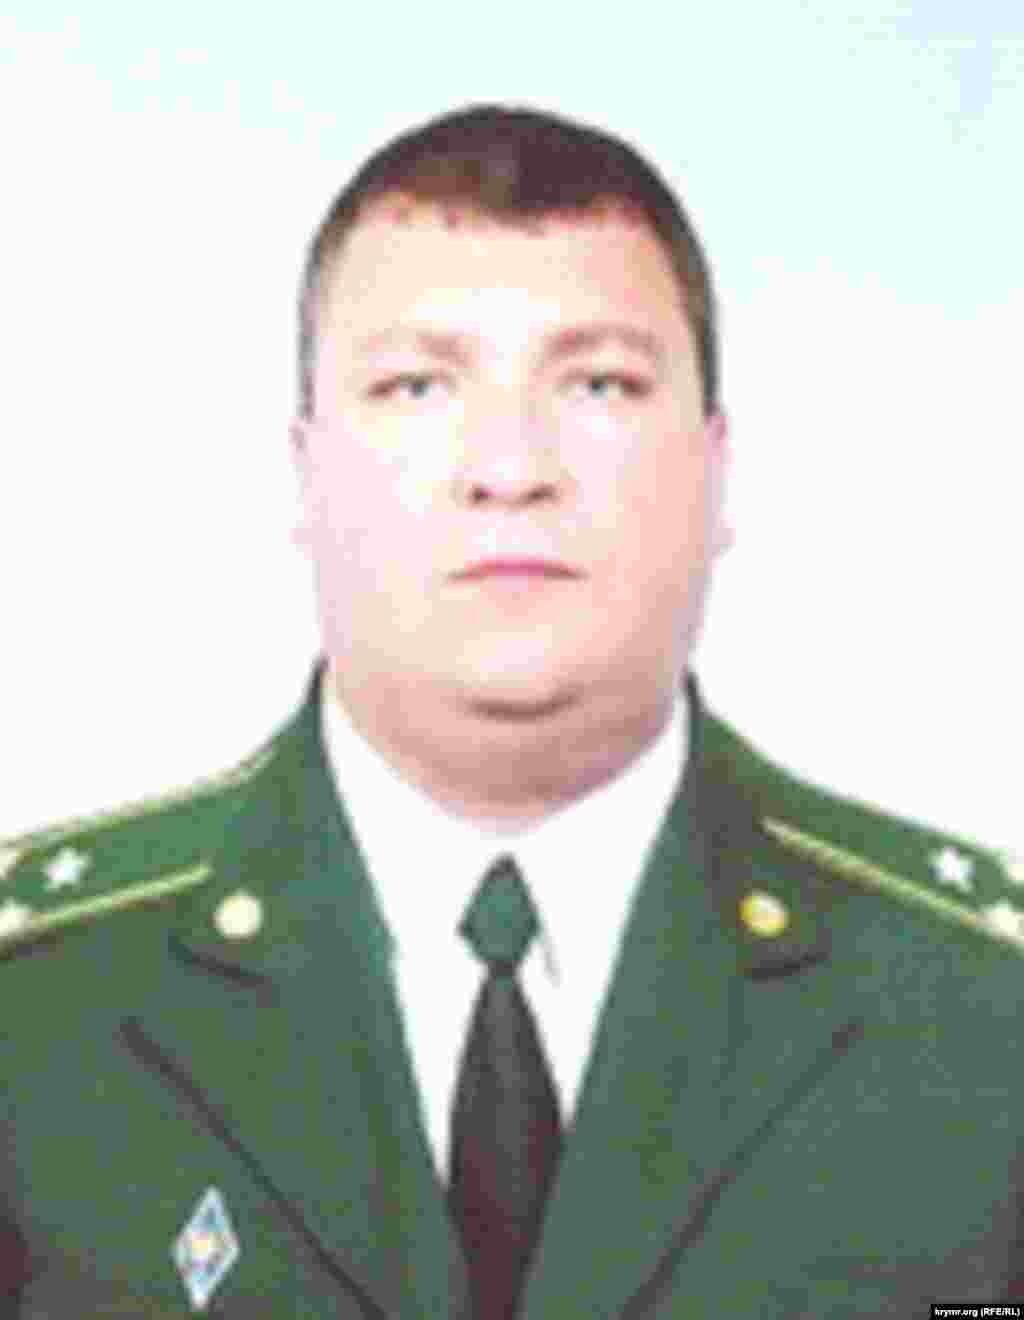 Андрей Порвалов - сотрудник ФСБ на судостроительном заводе «Море» (Феодосия)